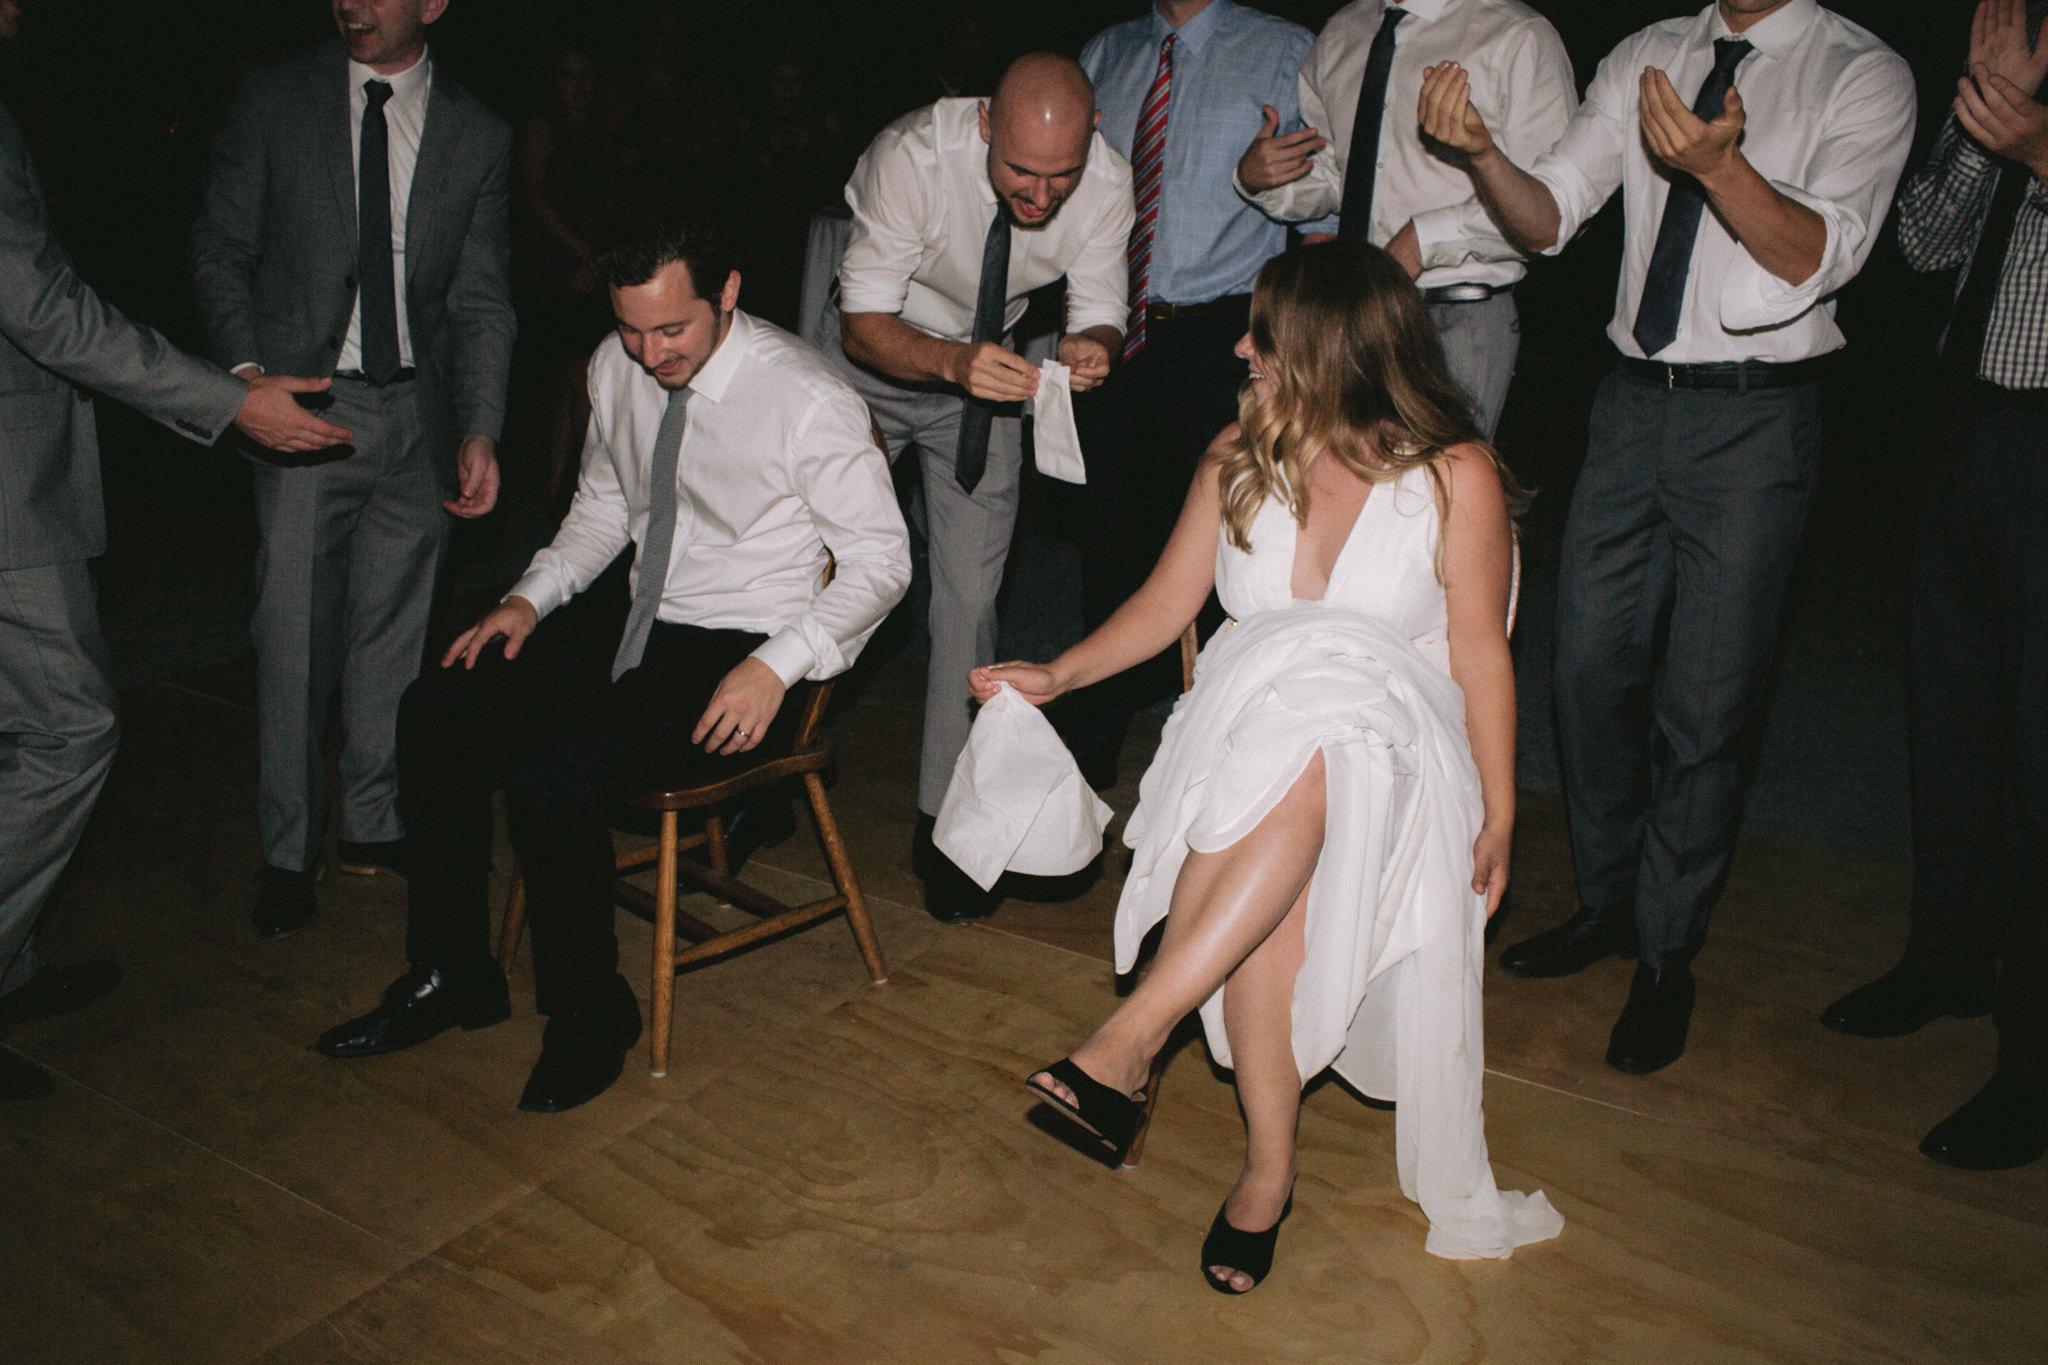 Backyard-Bainbridge-Island-Wedding-Alycia-Lovell-Photography-266.JPG